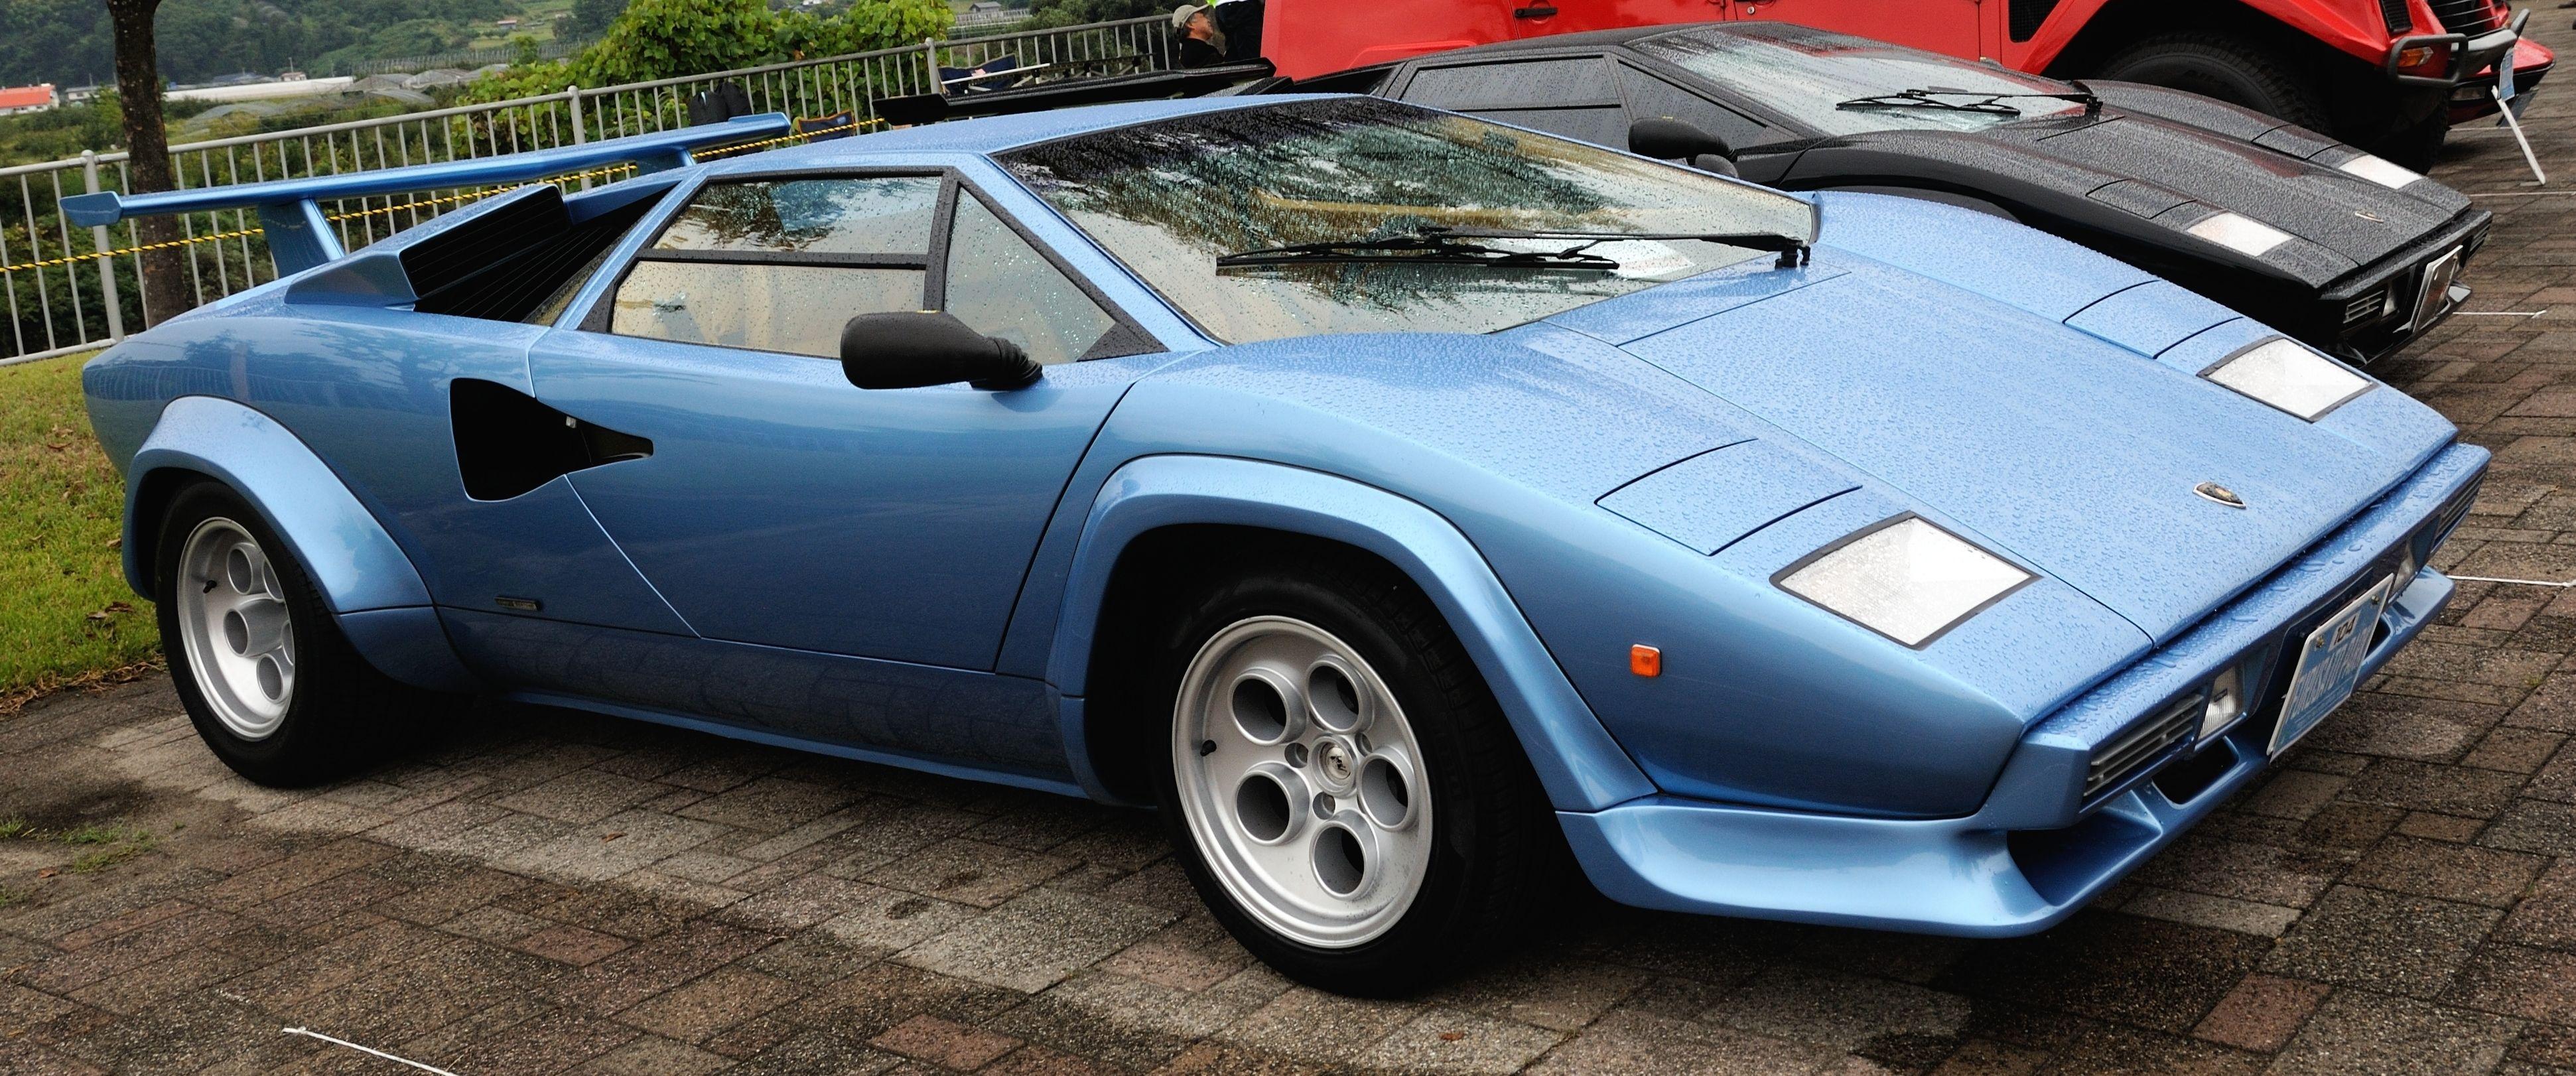 4d5efe875f82e422d9897fe8c37a6637 Breathtaking Lamborghini Countach Need for Speed Cars Trend